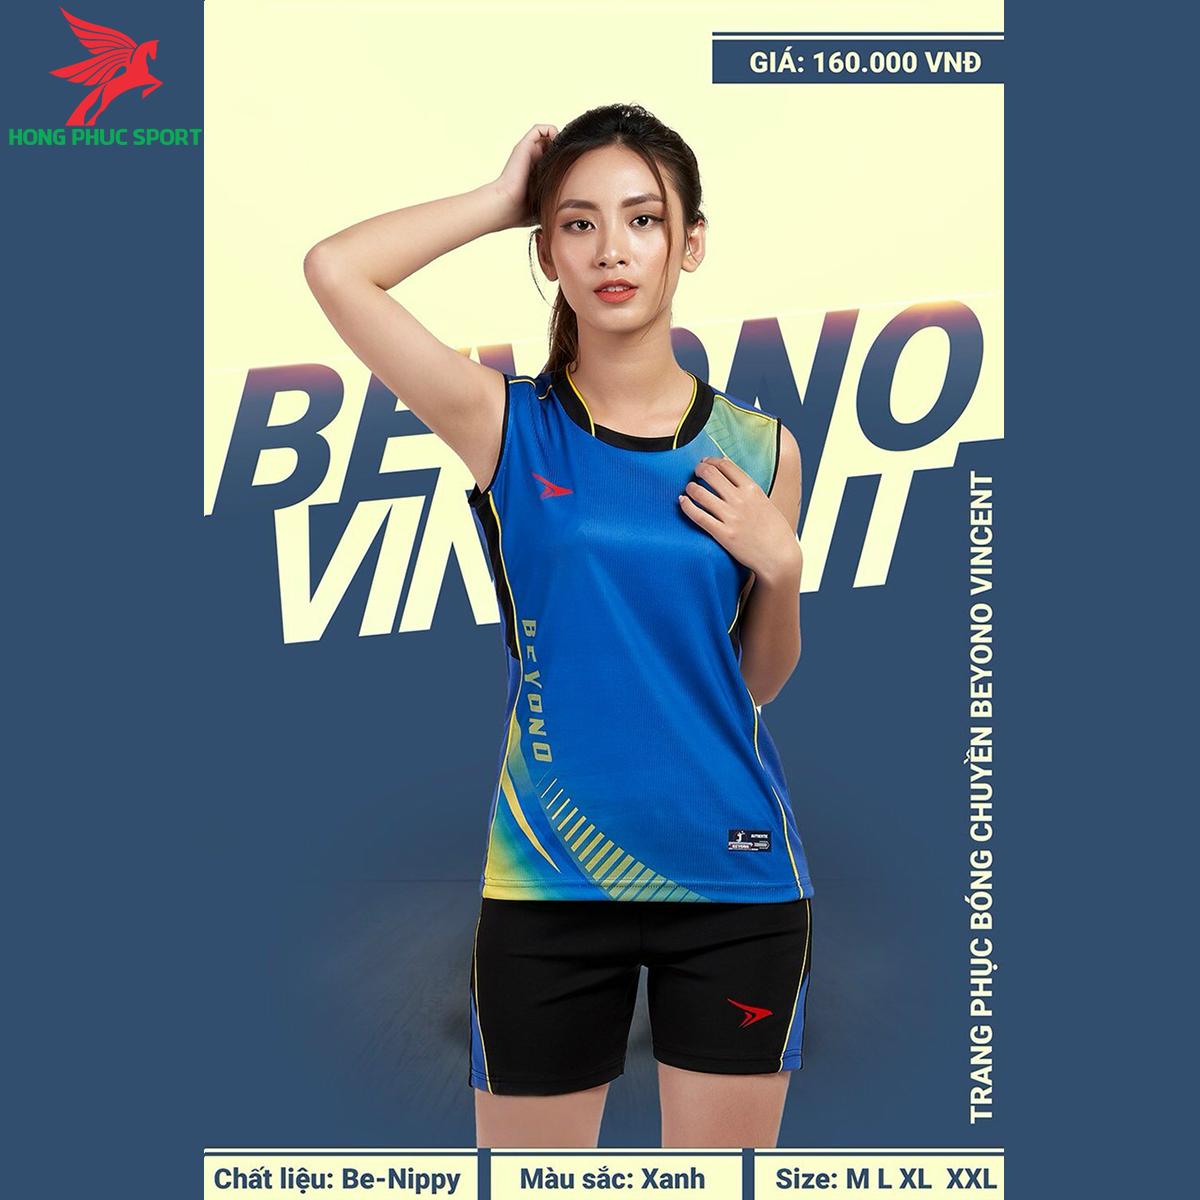 https://cdn.hongphucsport.com/unsafe/s4.shopbay.vn/files/285/ao-bong-chuyen-beyono-vincent-mau-xanh-3-6039bd3f69e74.png